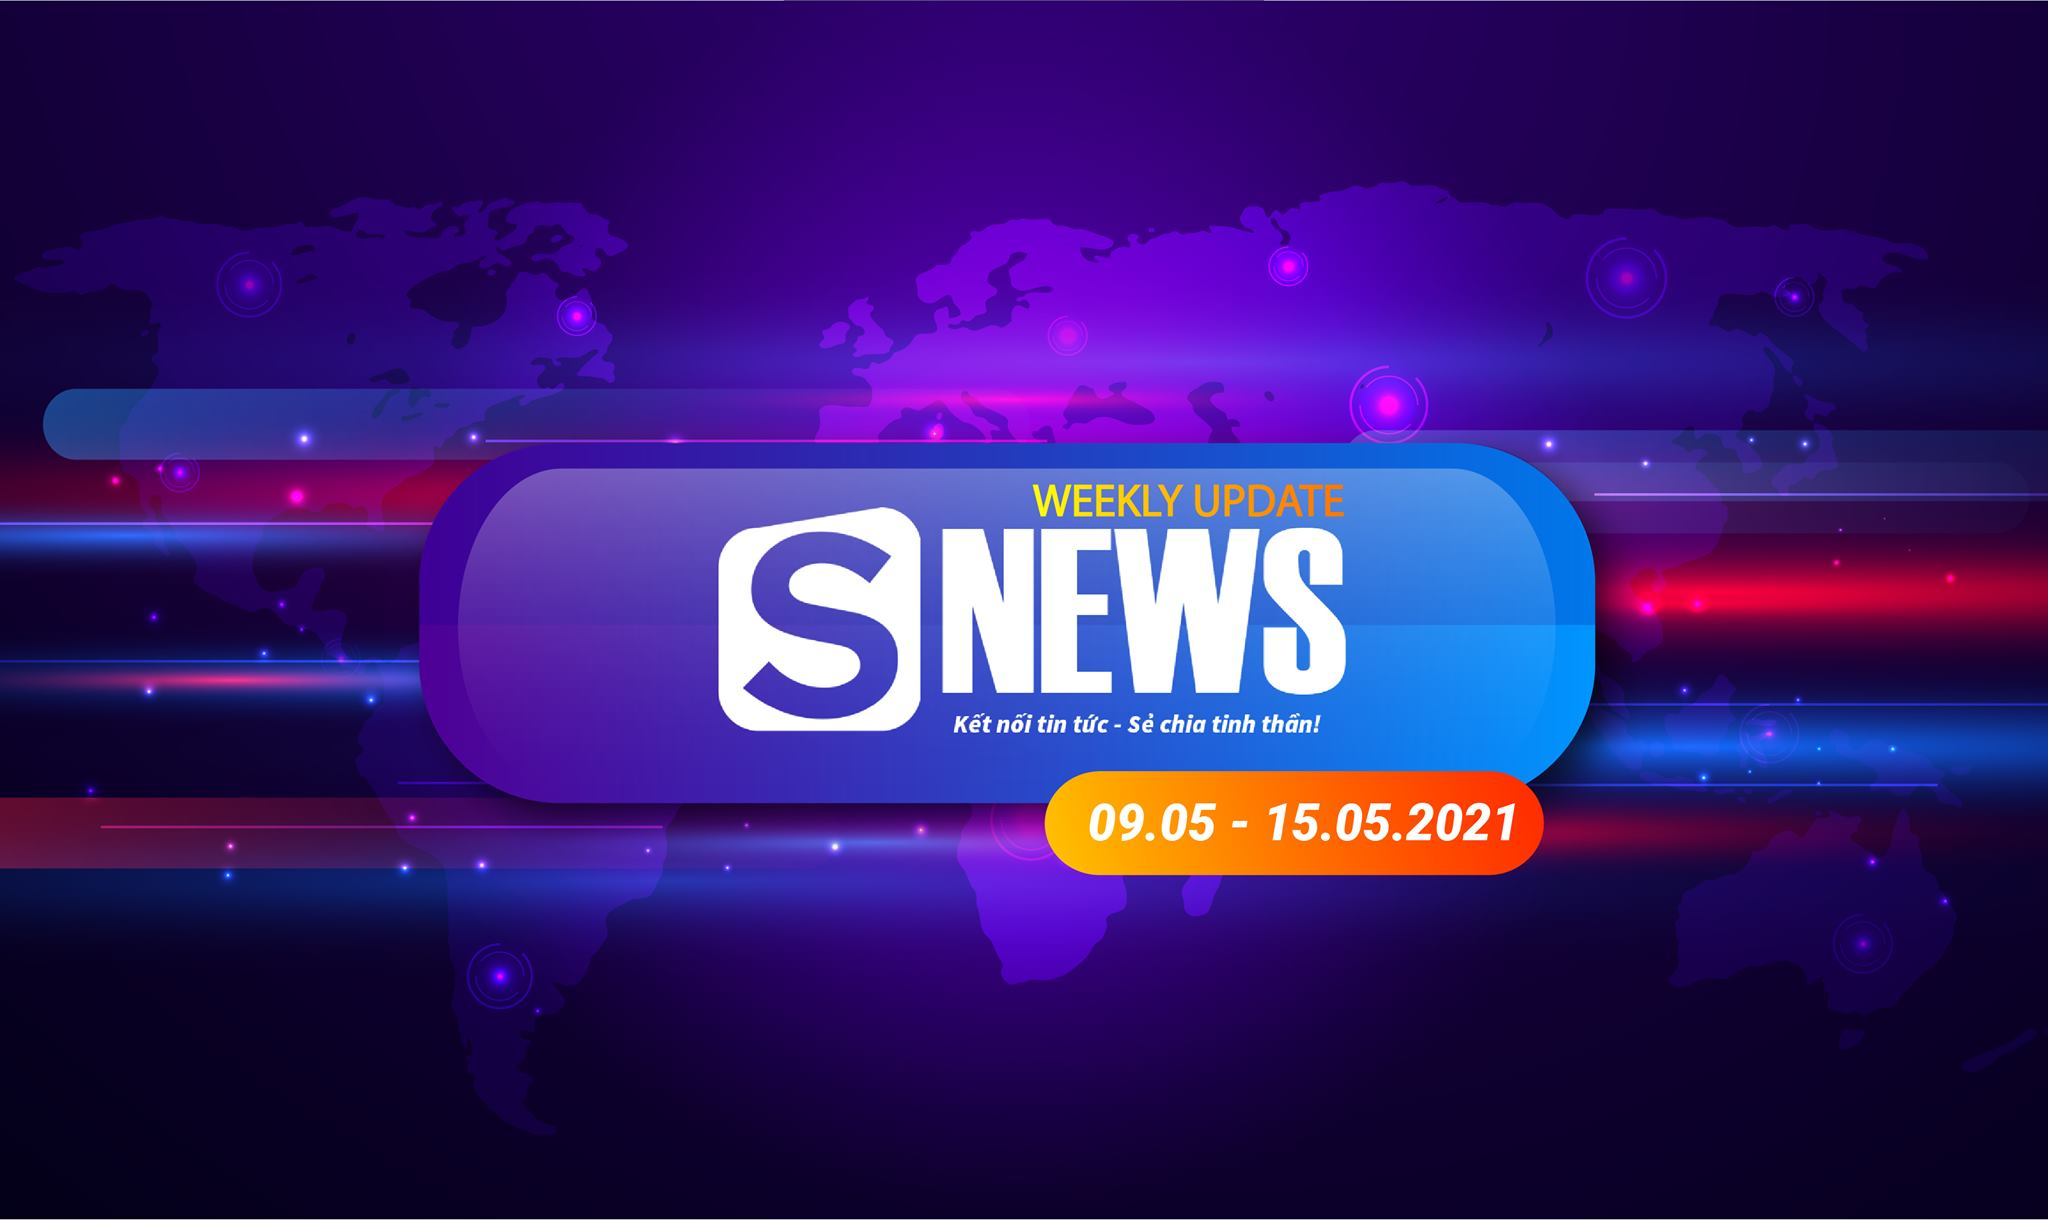 Tổng hợp tin tức Sapo tuần qua: 09.05 - 15.05.2021